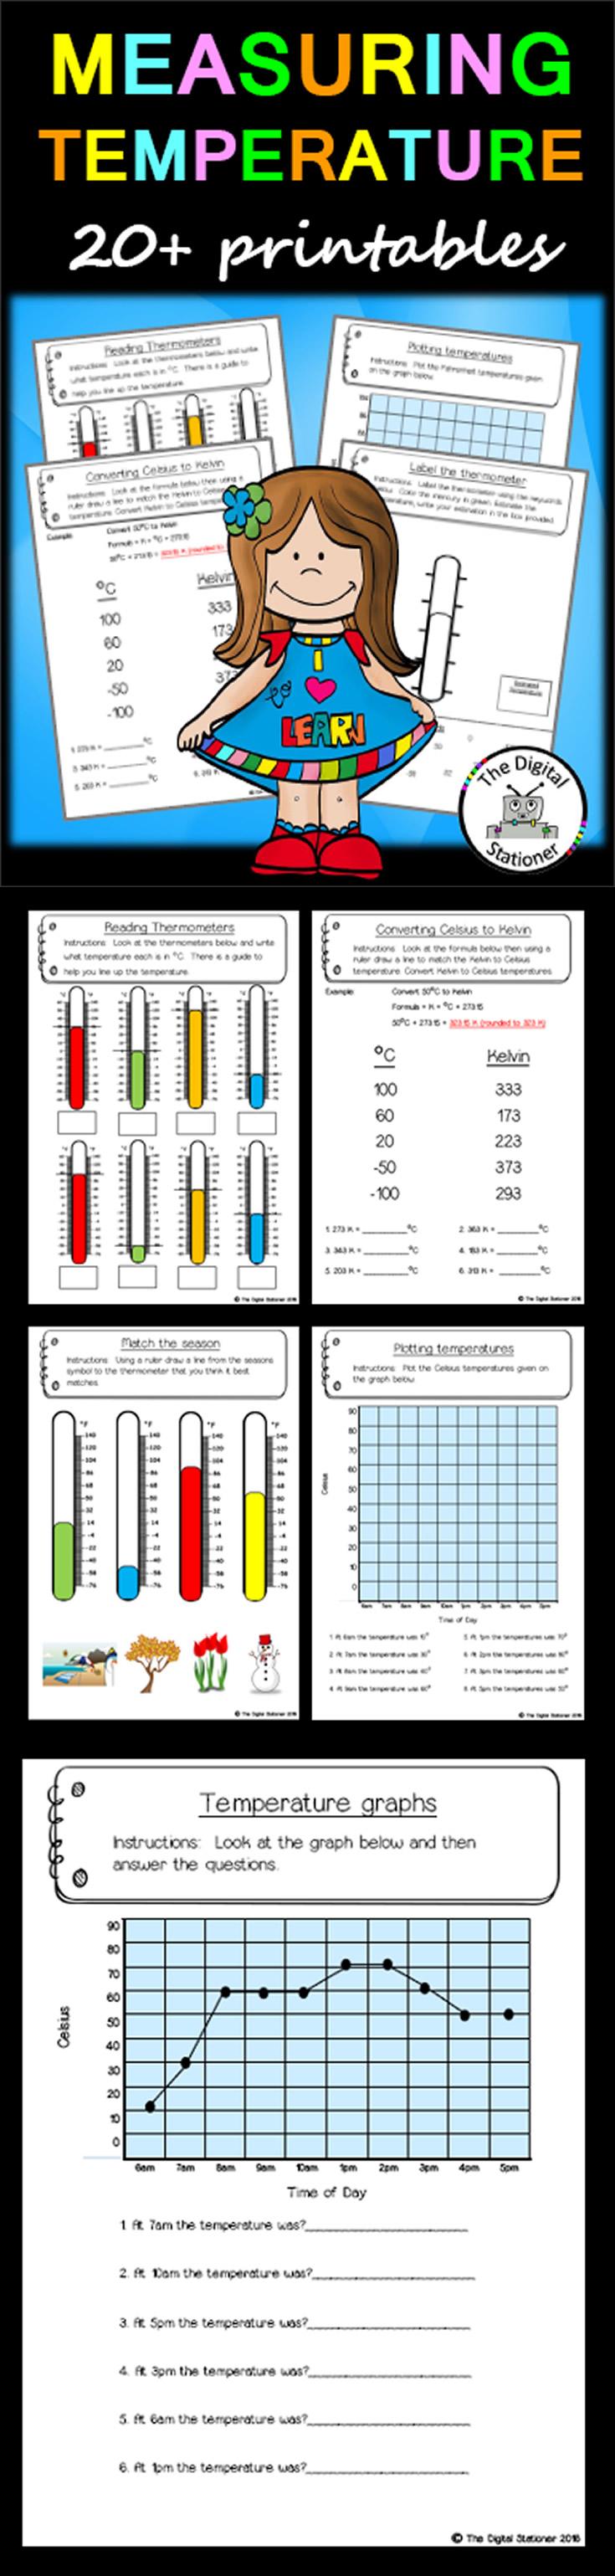 small resolution of Measuring Temperature – 20+ printables (Measurement \u0026 Data)   Homeschool  programs